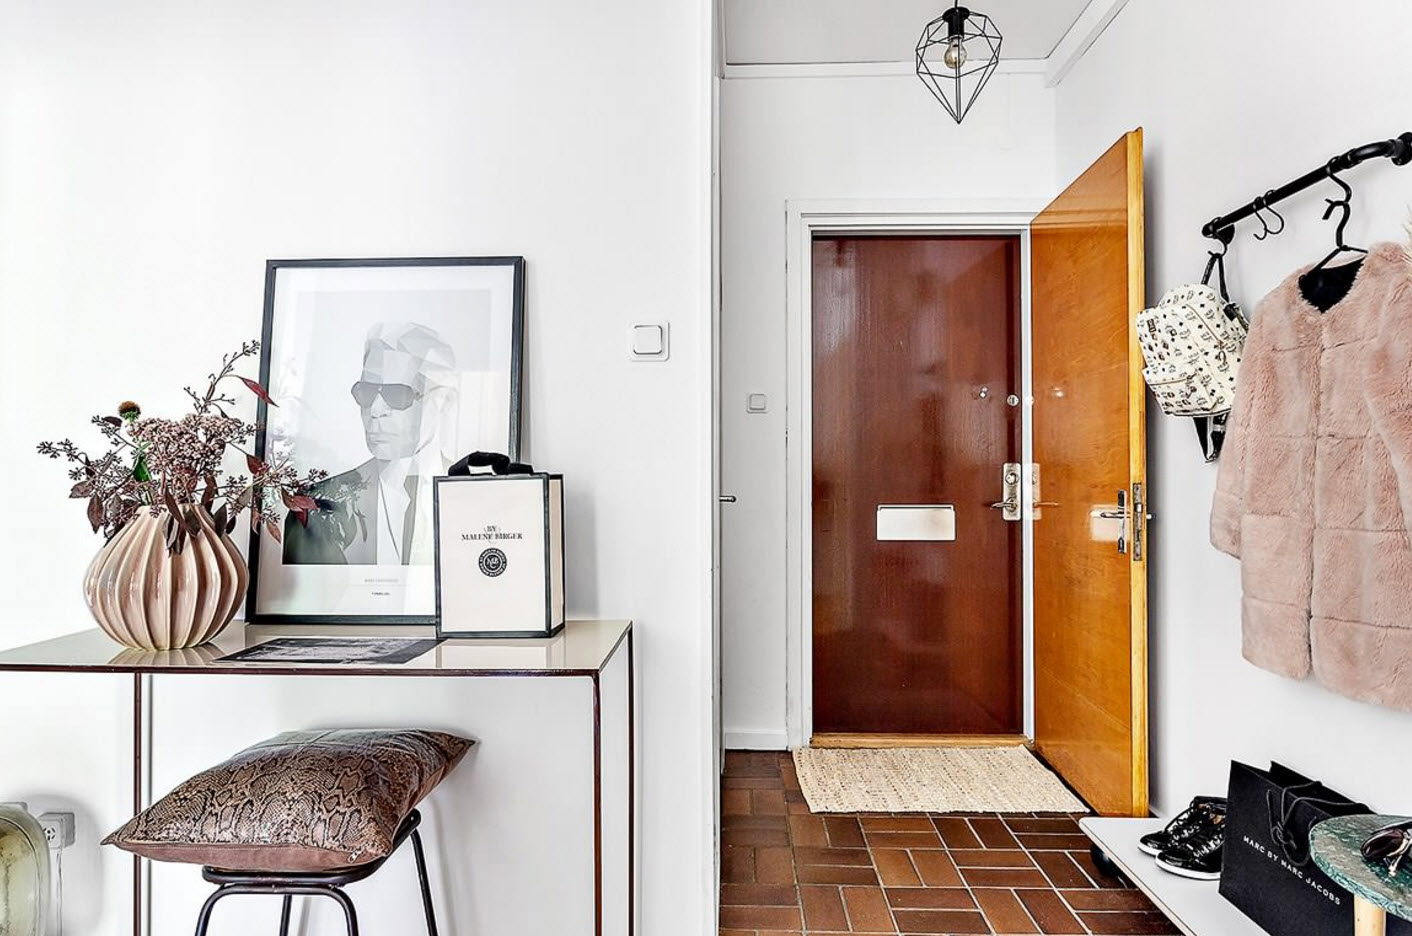 Вариант для малогабаритной квартиры